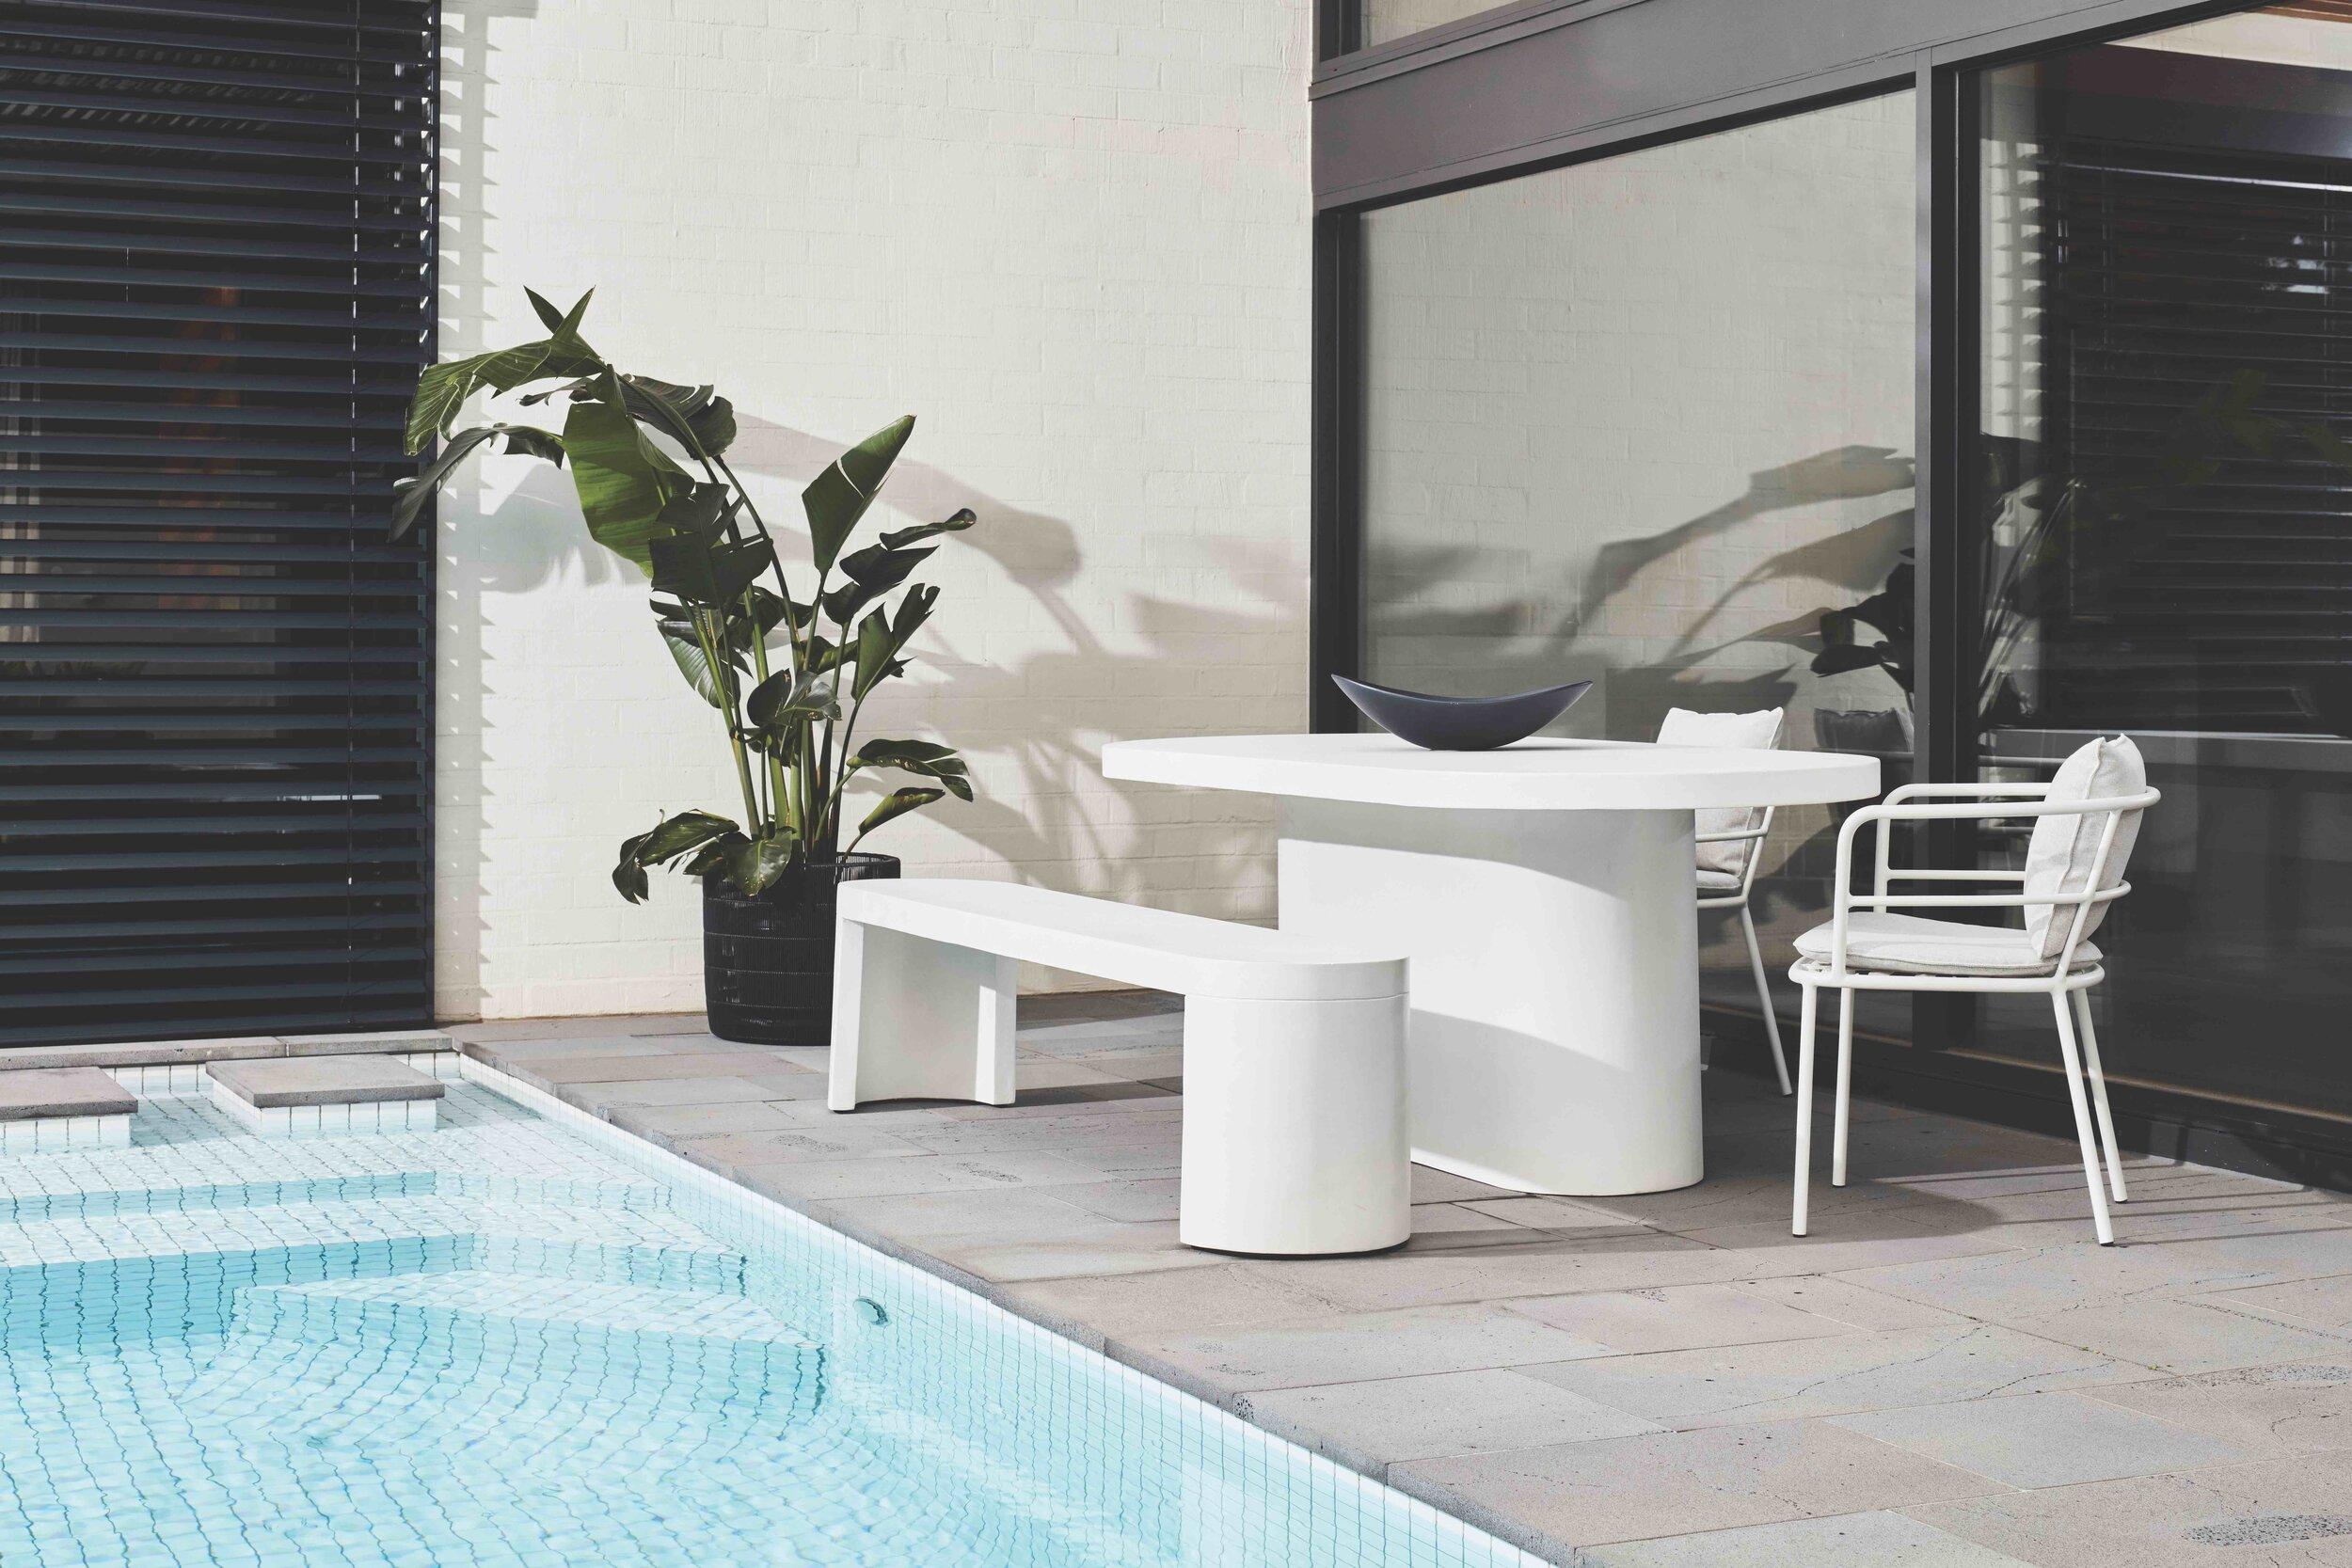 Ossa Oval DT-Ossa Bench-Lyon Chair - Landscape 2020.jpg